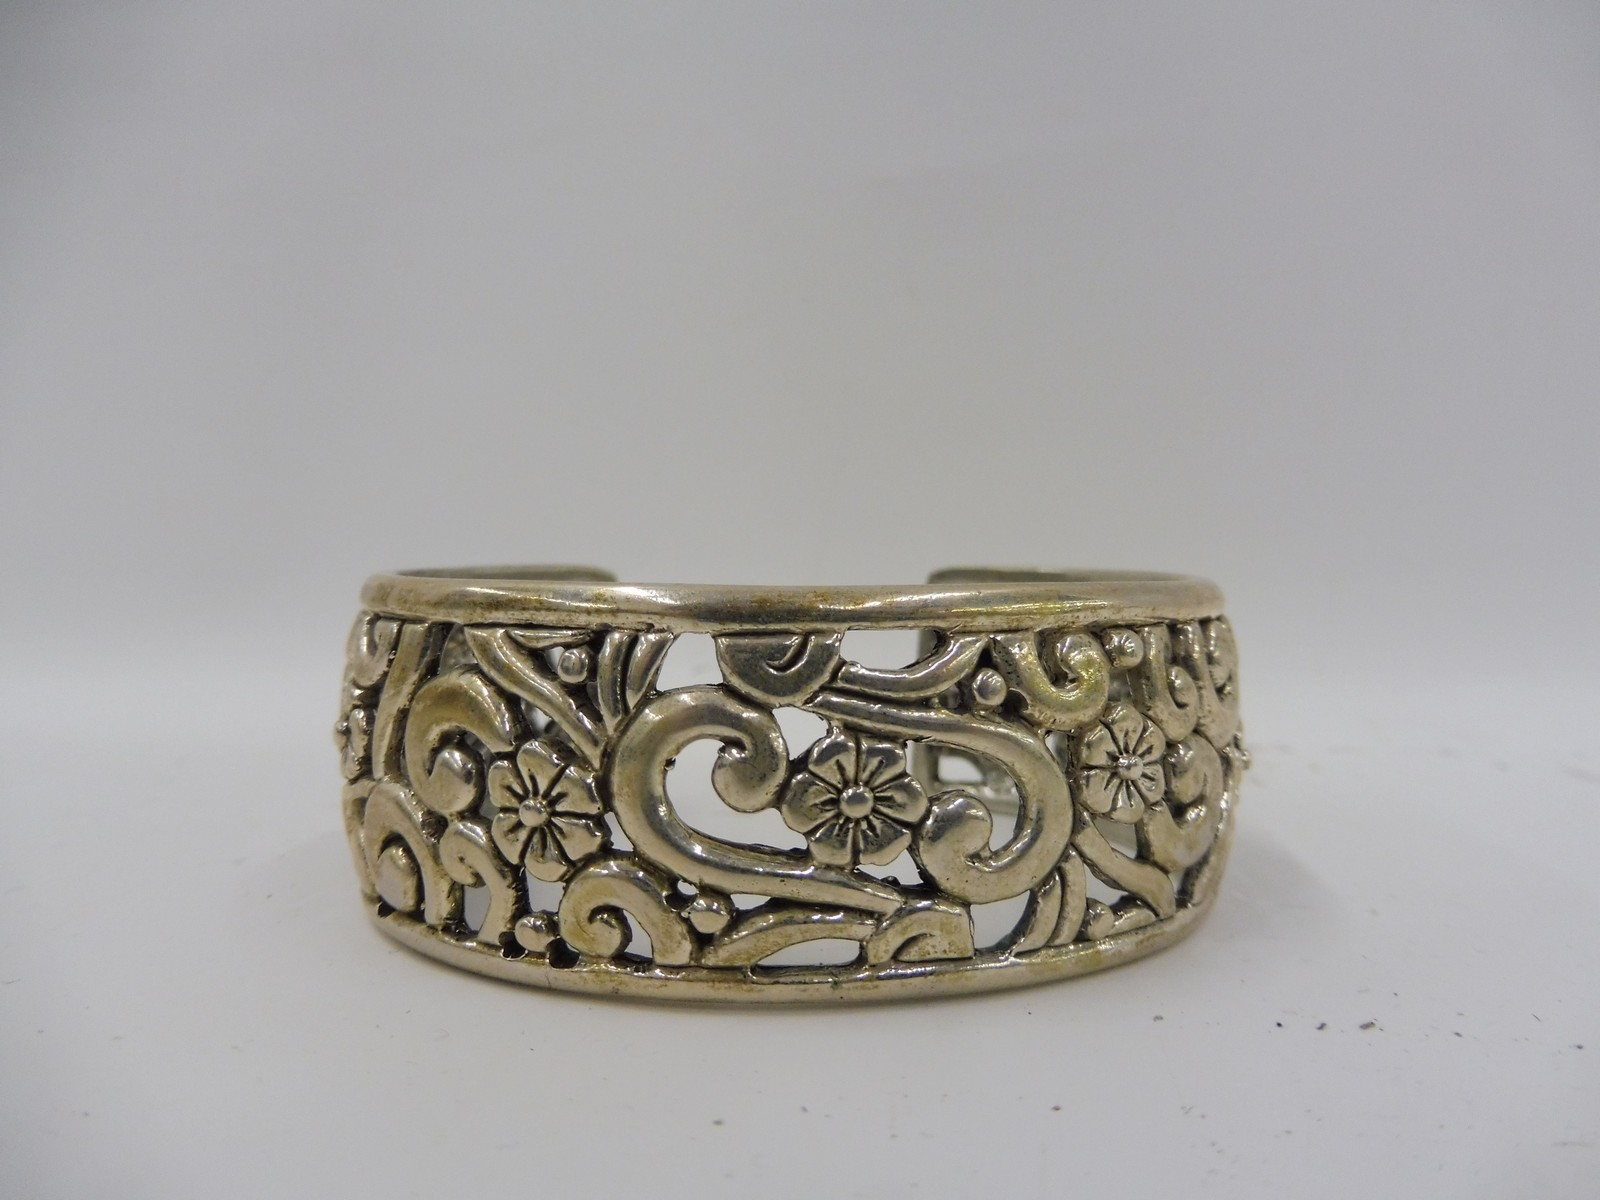 Lot 5 - A silver bracelet, hallmarked for Birmingham.